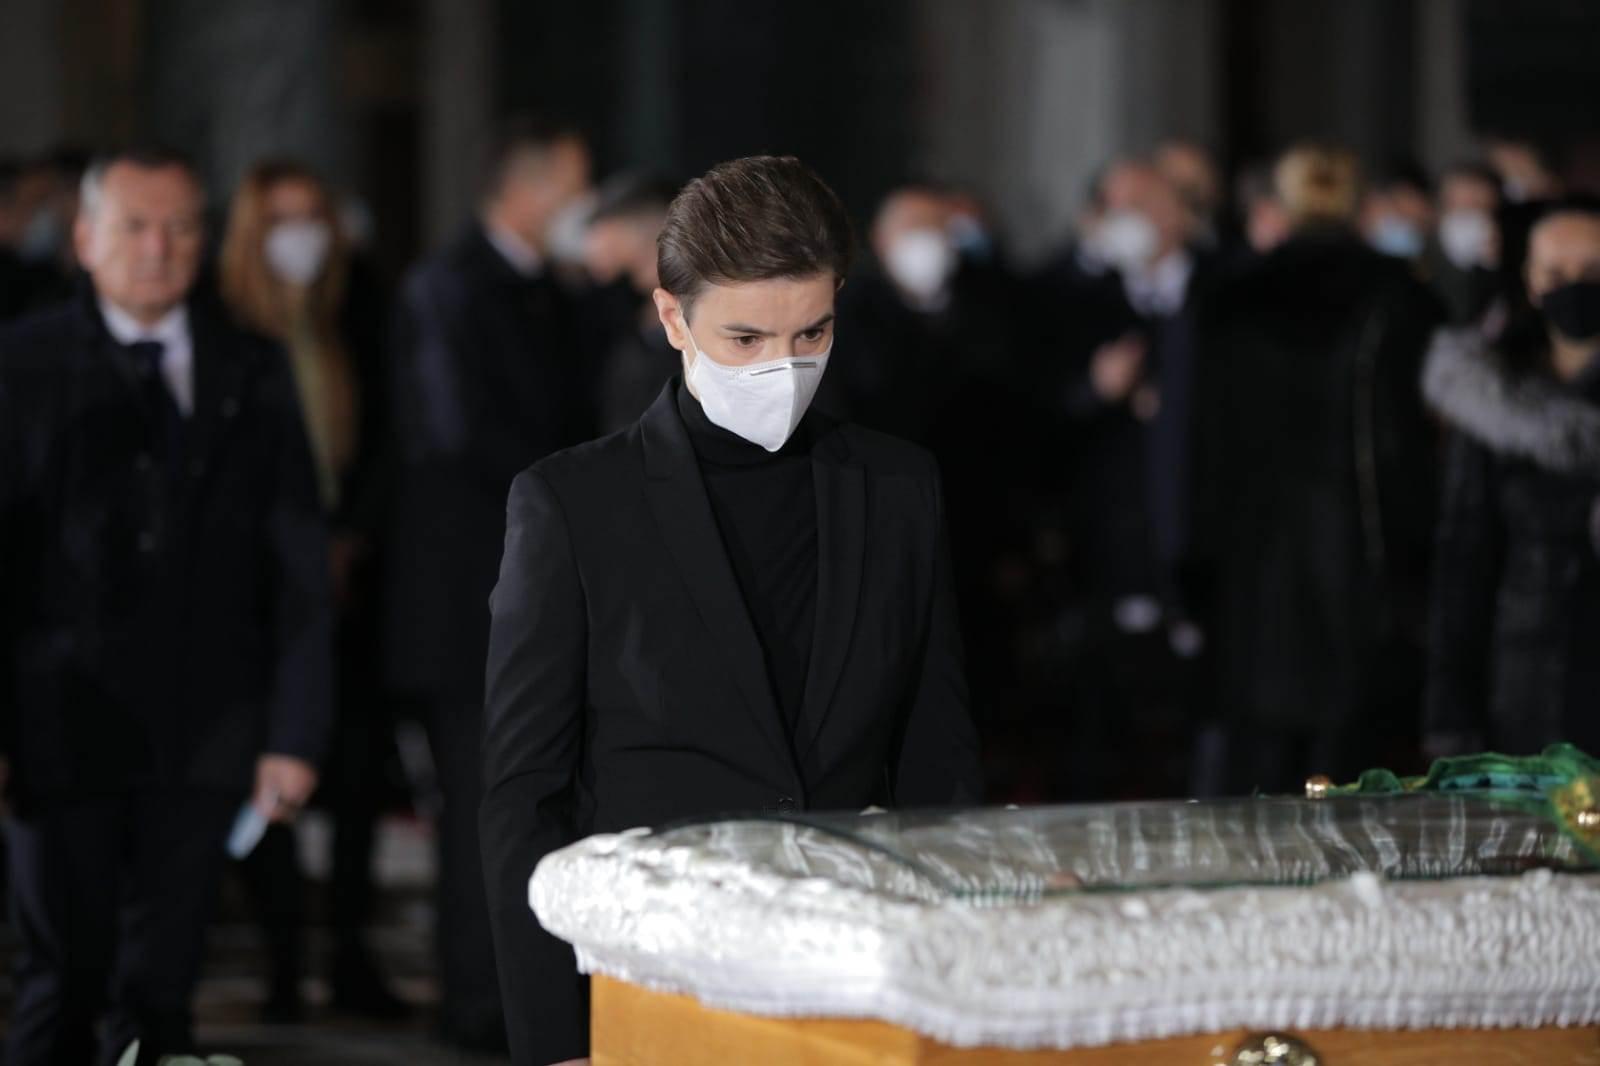 sahrana irinej patrijarh političari